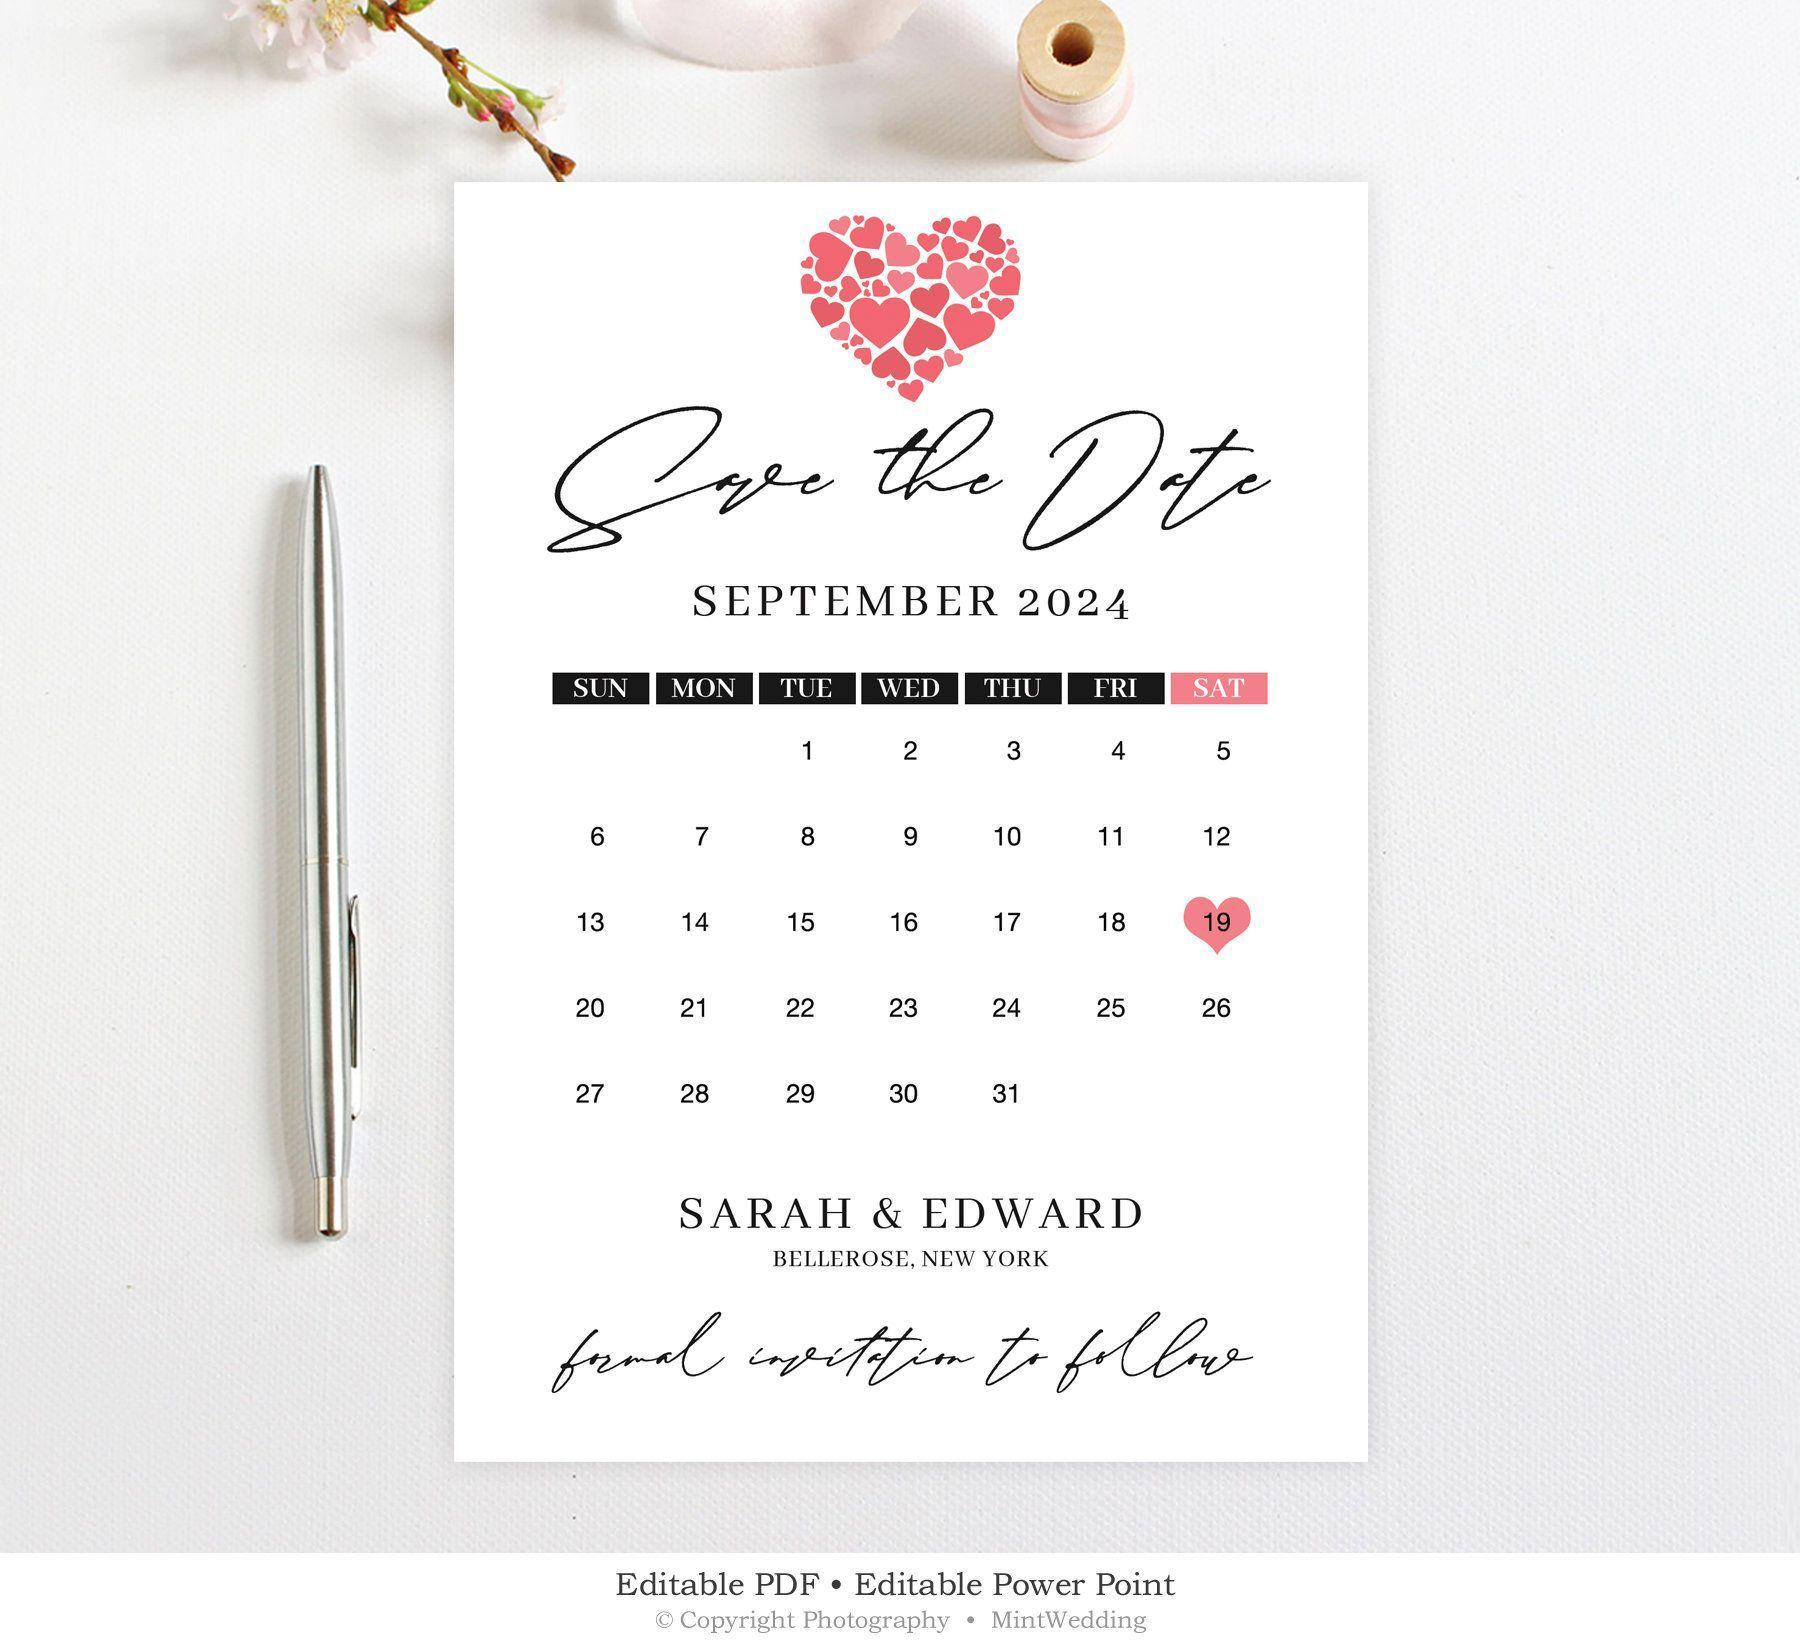 Save The Date Calendar Template Wedding Save The Date Printable Funny Save The Date Card M Wedding Saving Wedding Save The Dates Save The Date Templates